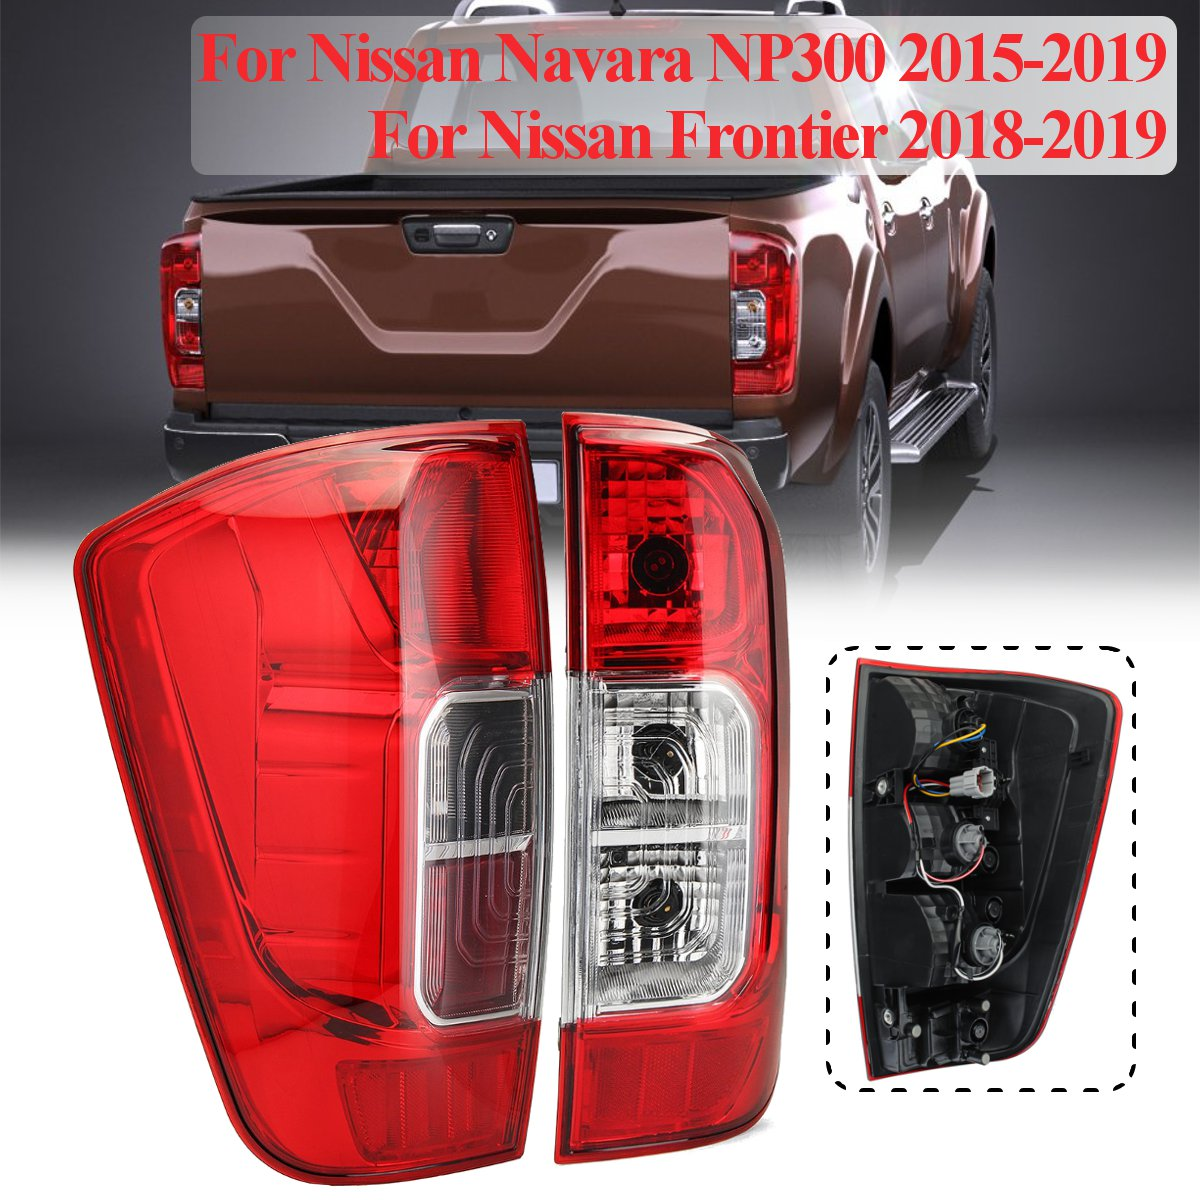 Rear Tail Light Lamp For Nissan Navara NP300 2015-2019 Frontier 2018-2019 Left